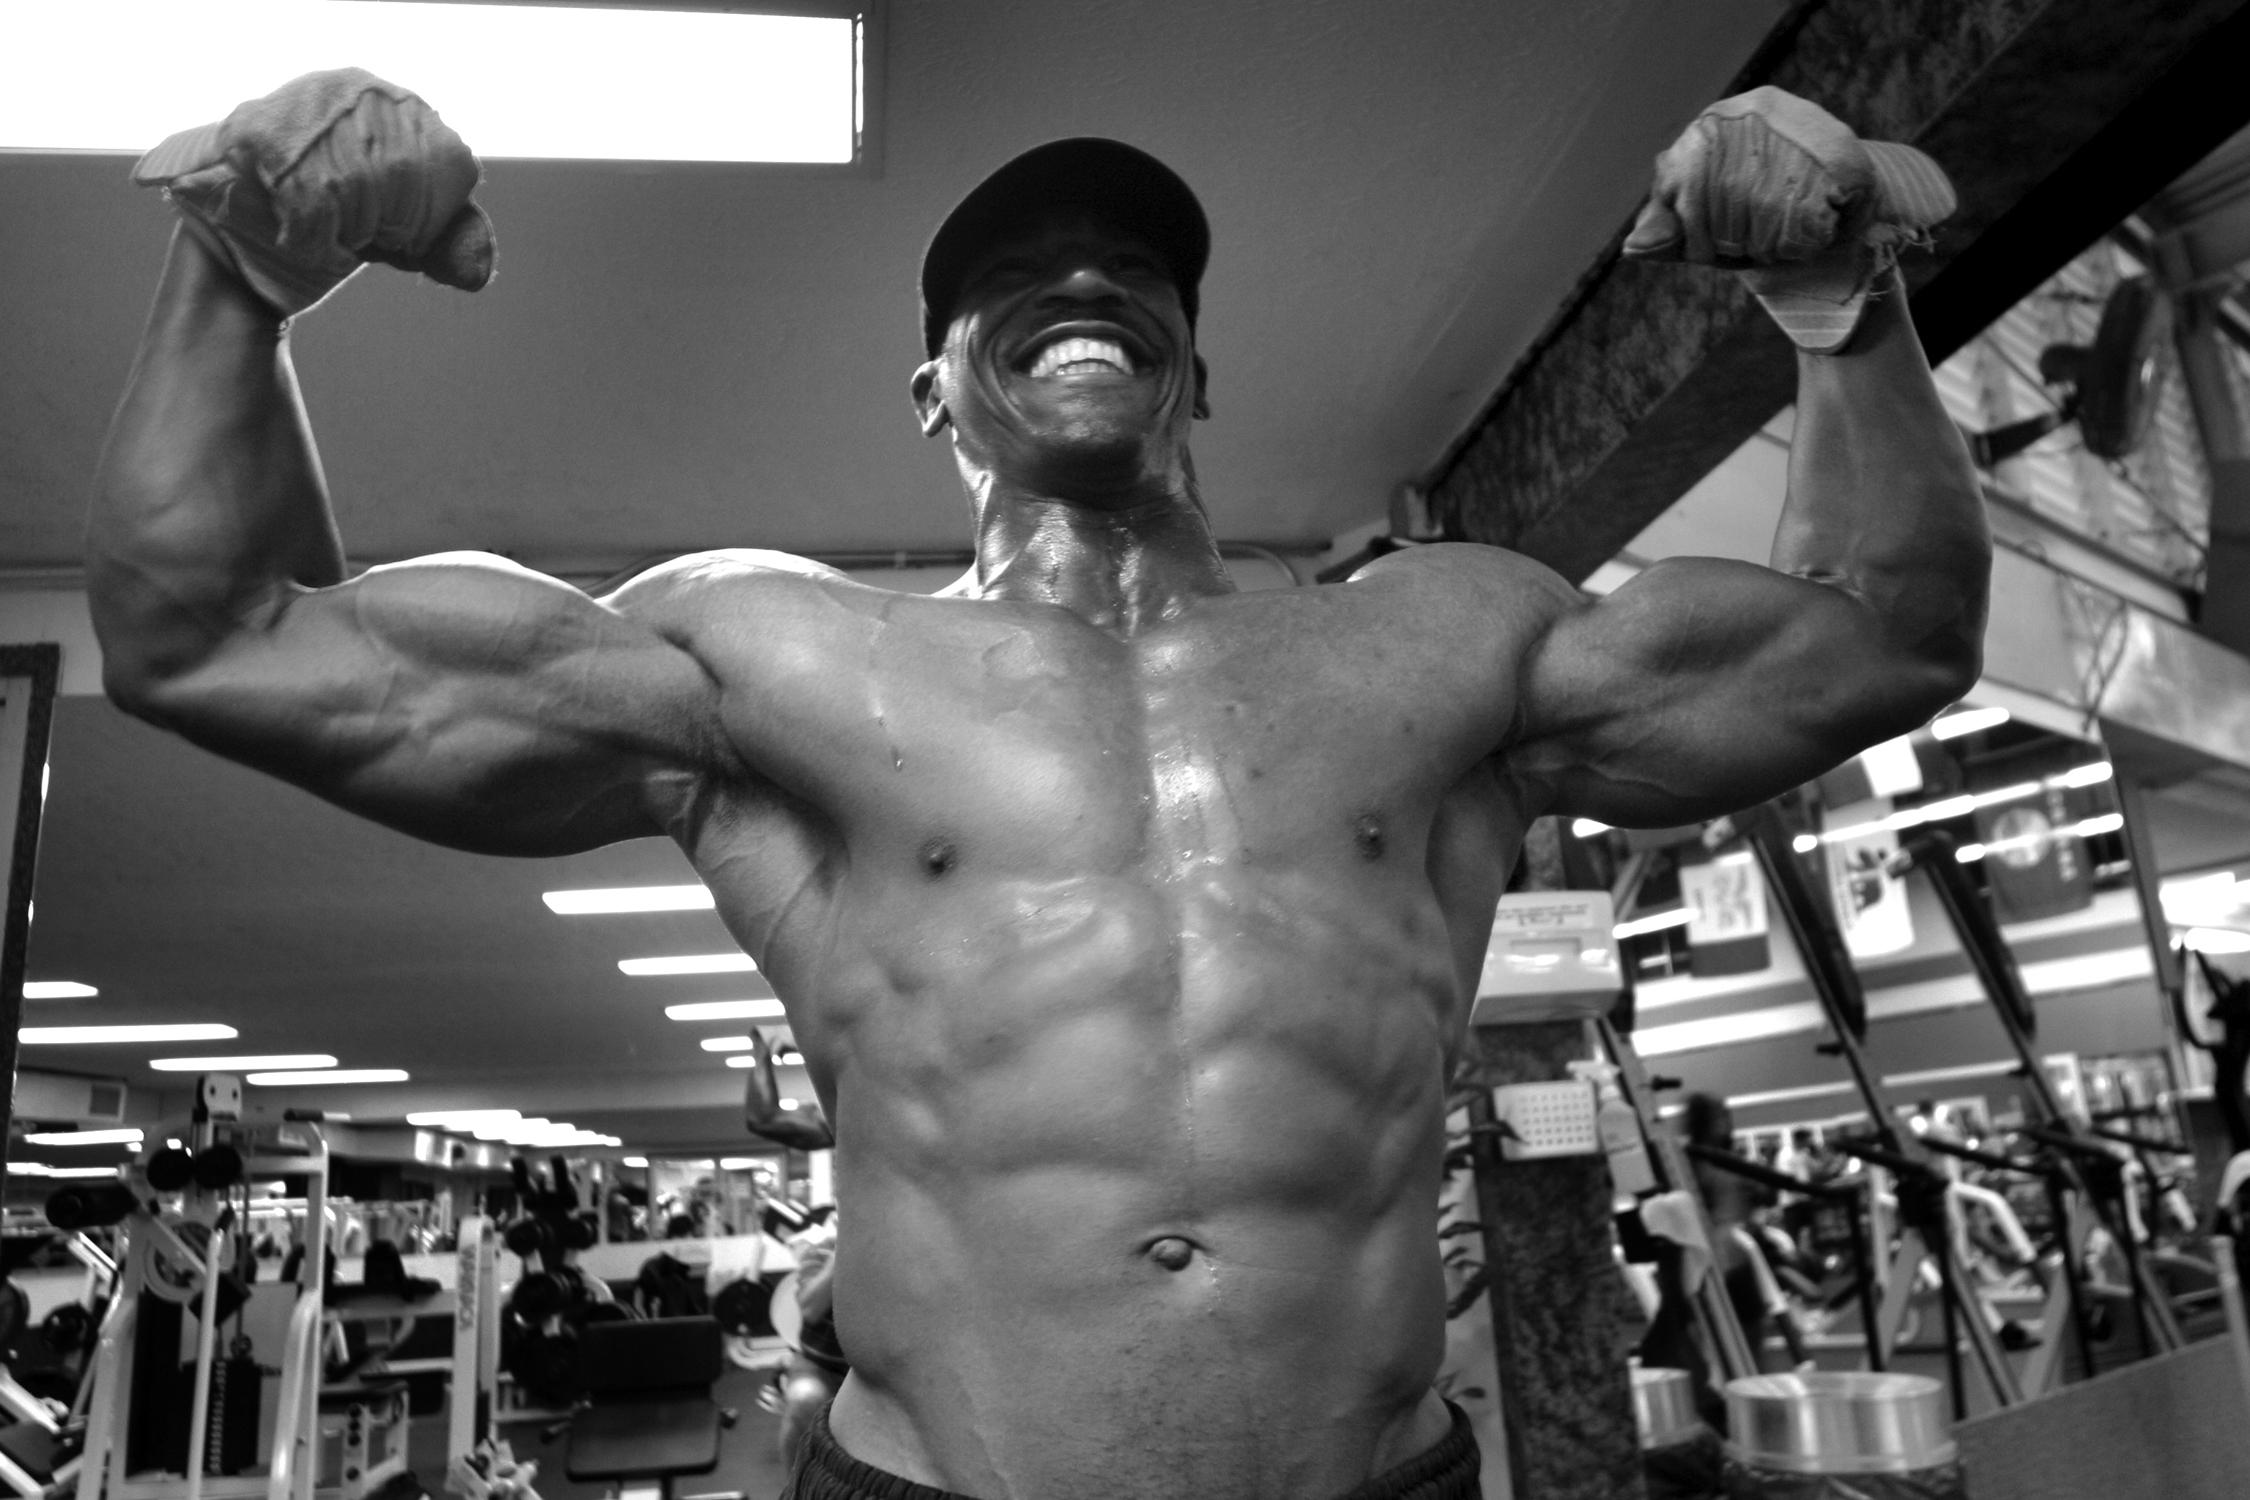 Бодибилдинг вред суставы бады эвалар суставы 24 отзывы